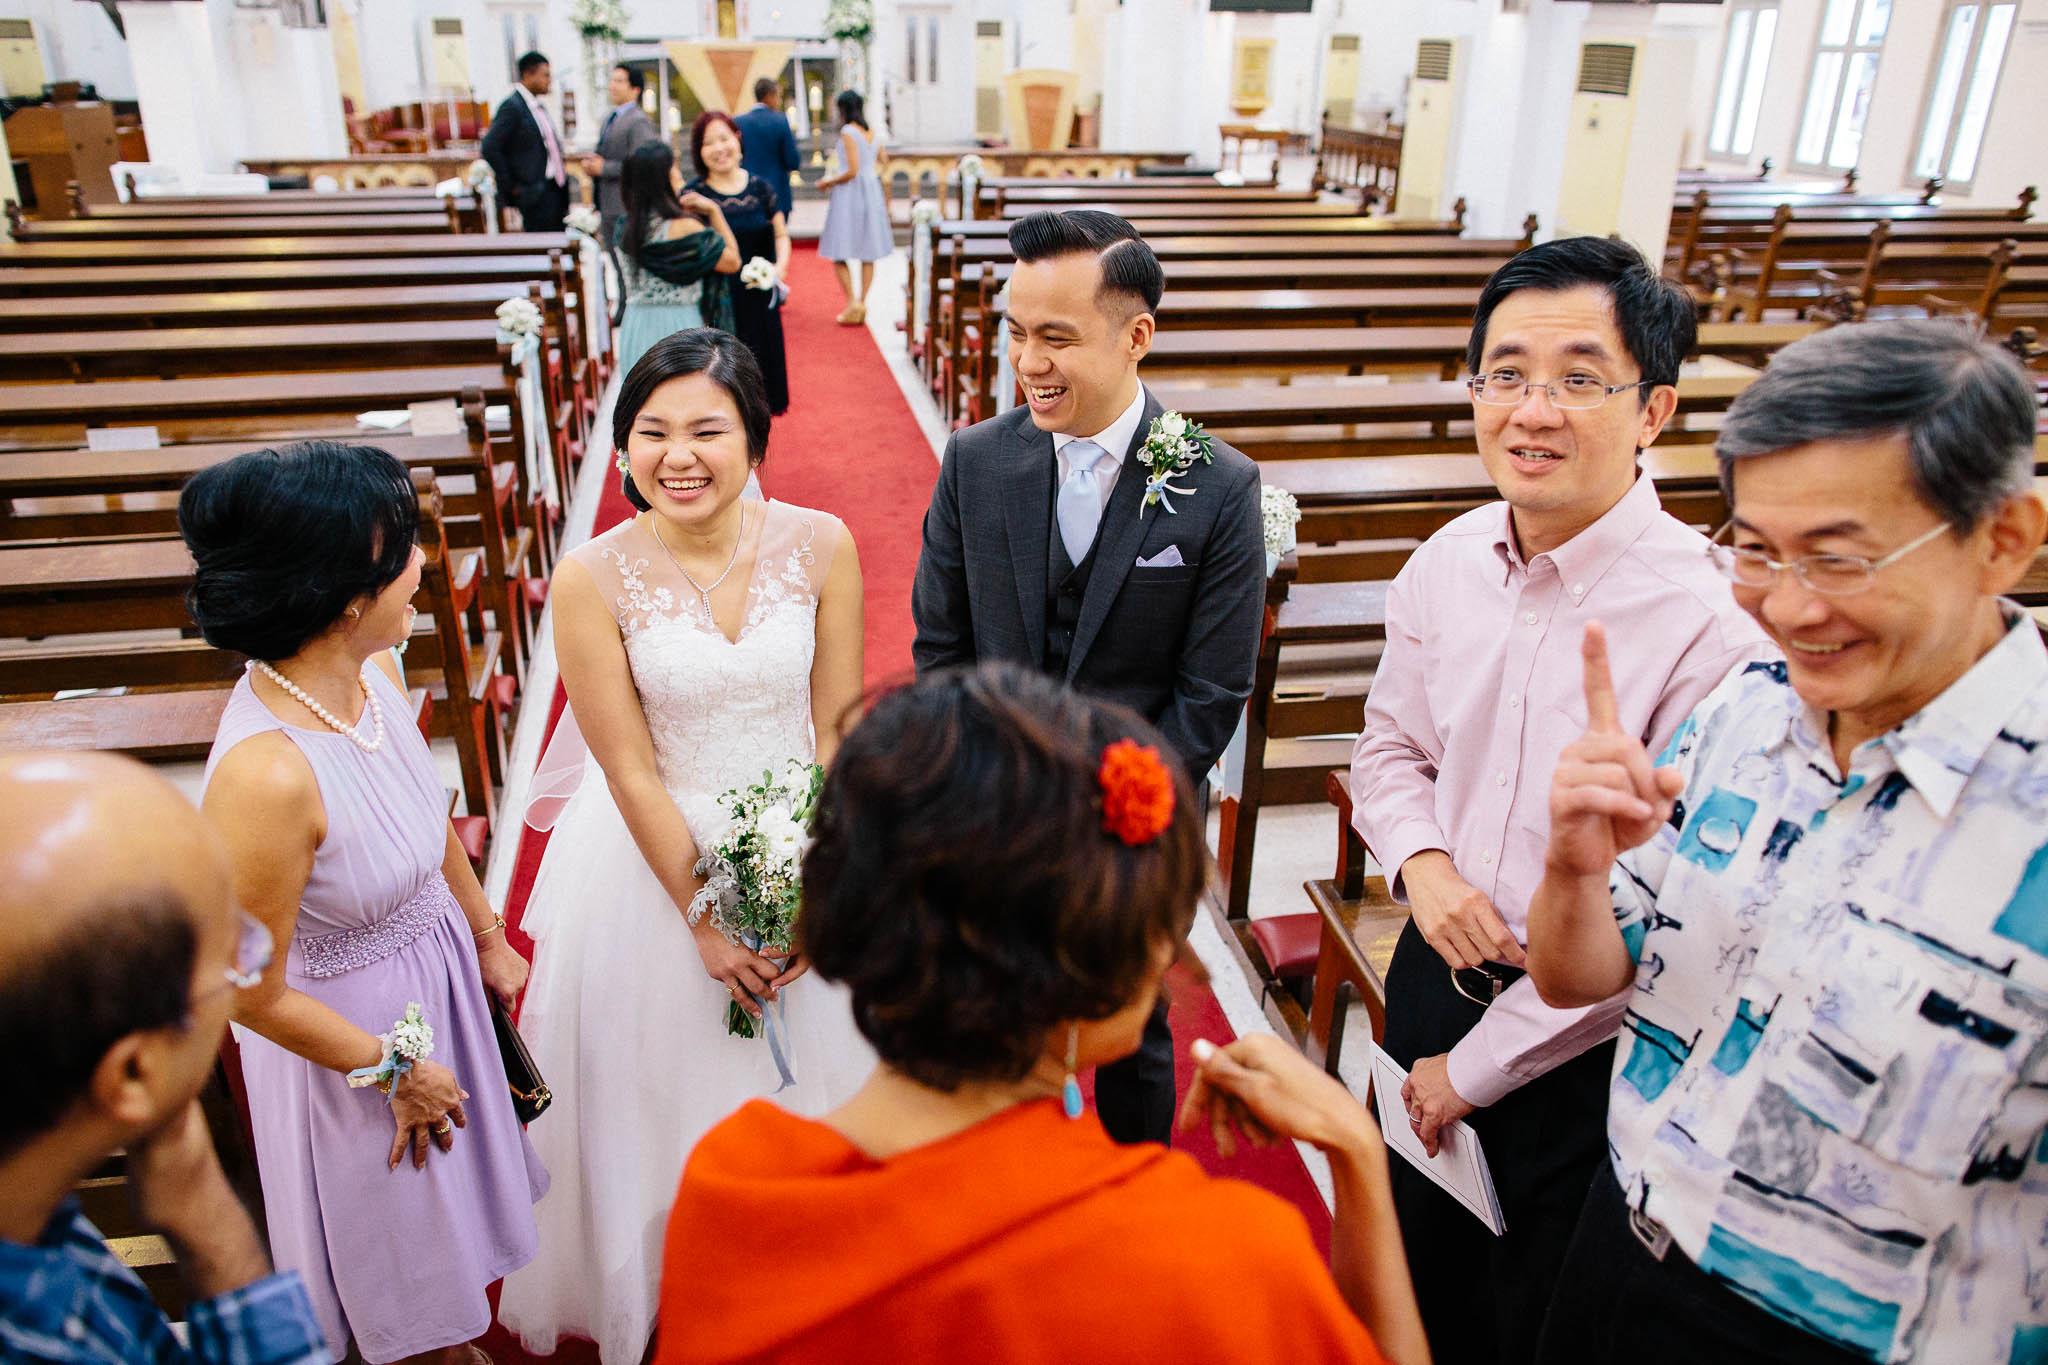 singapore-wedding-photographer-malay-indian-pre-wedding-travel-wmt-2015-jeremy-larissa-51.jpg